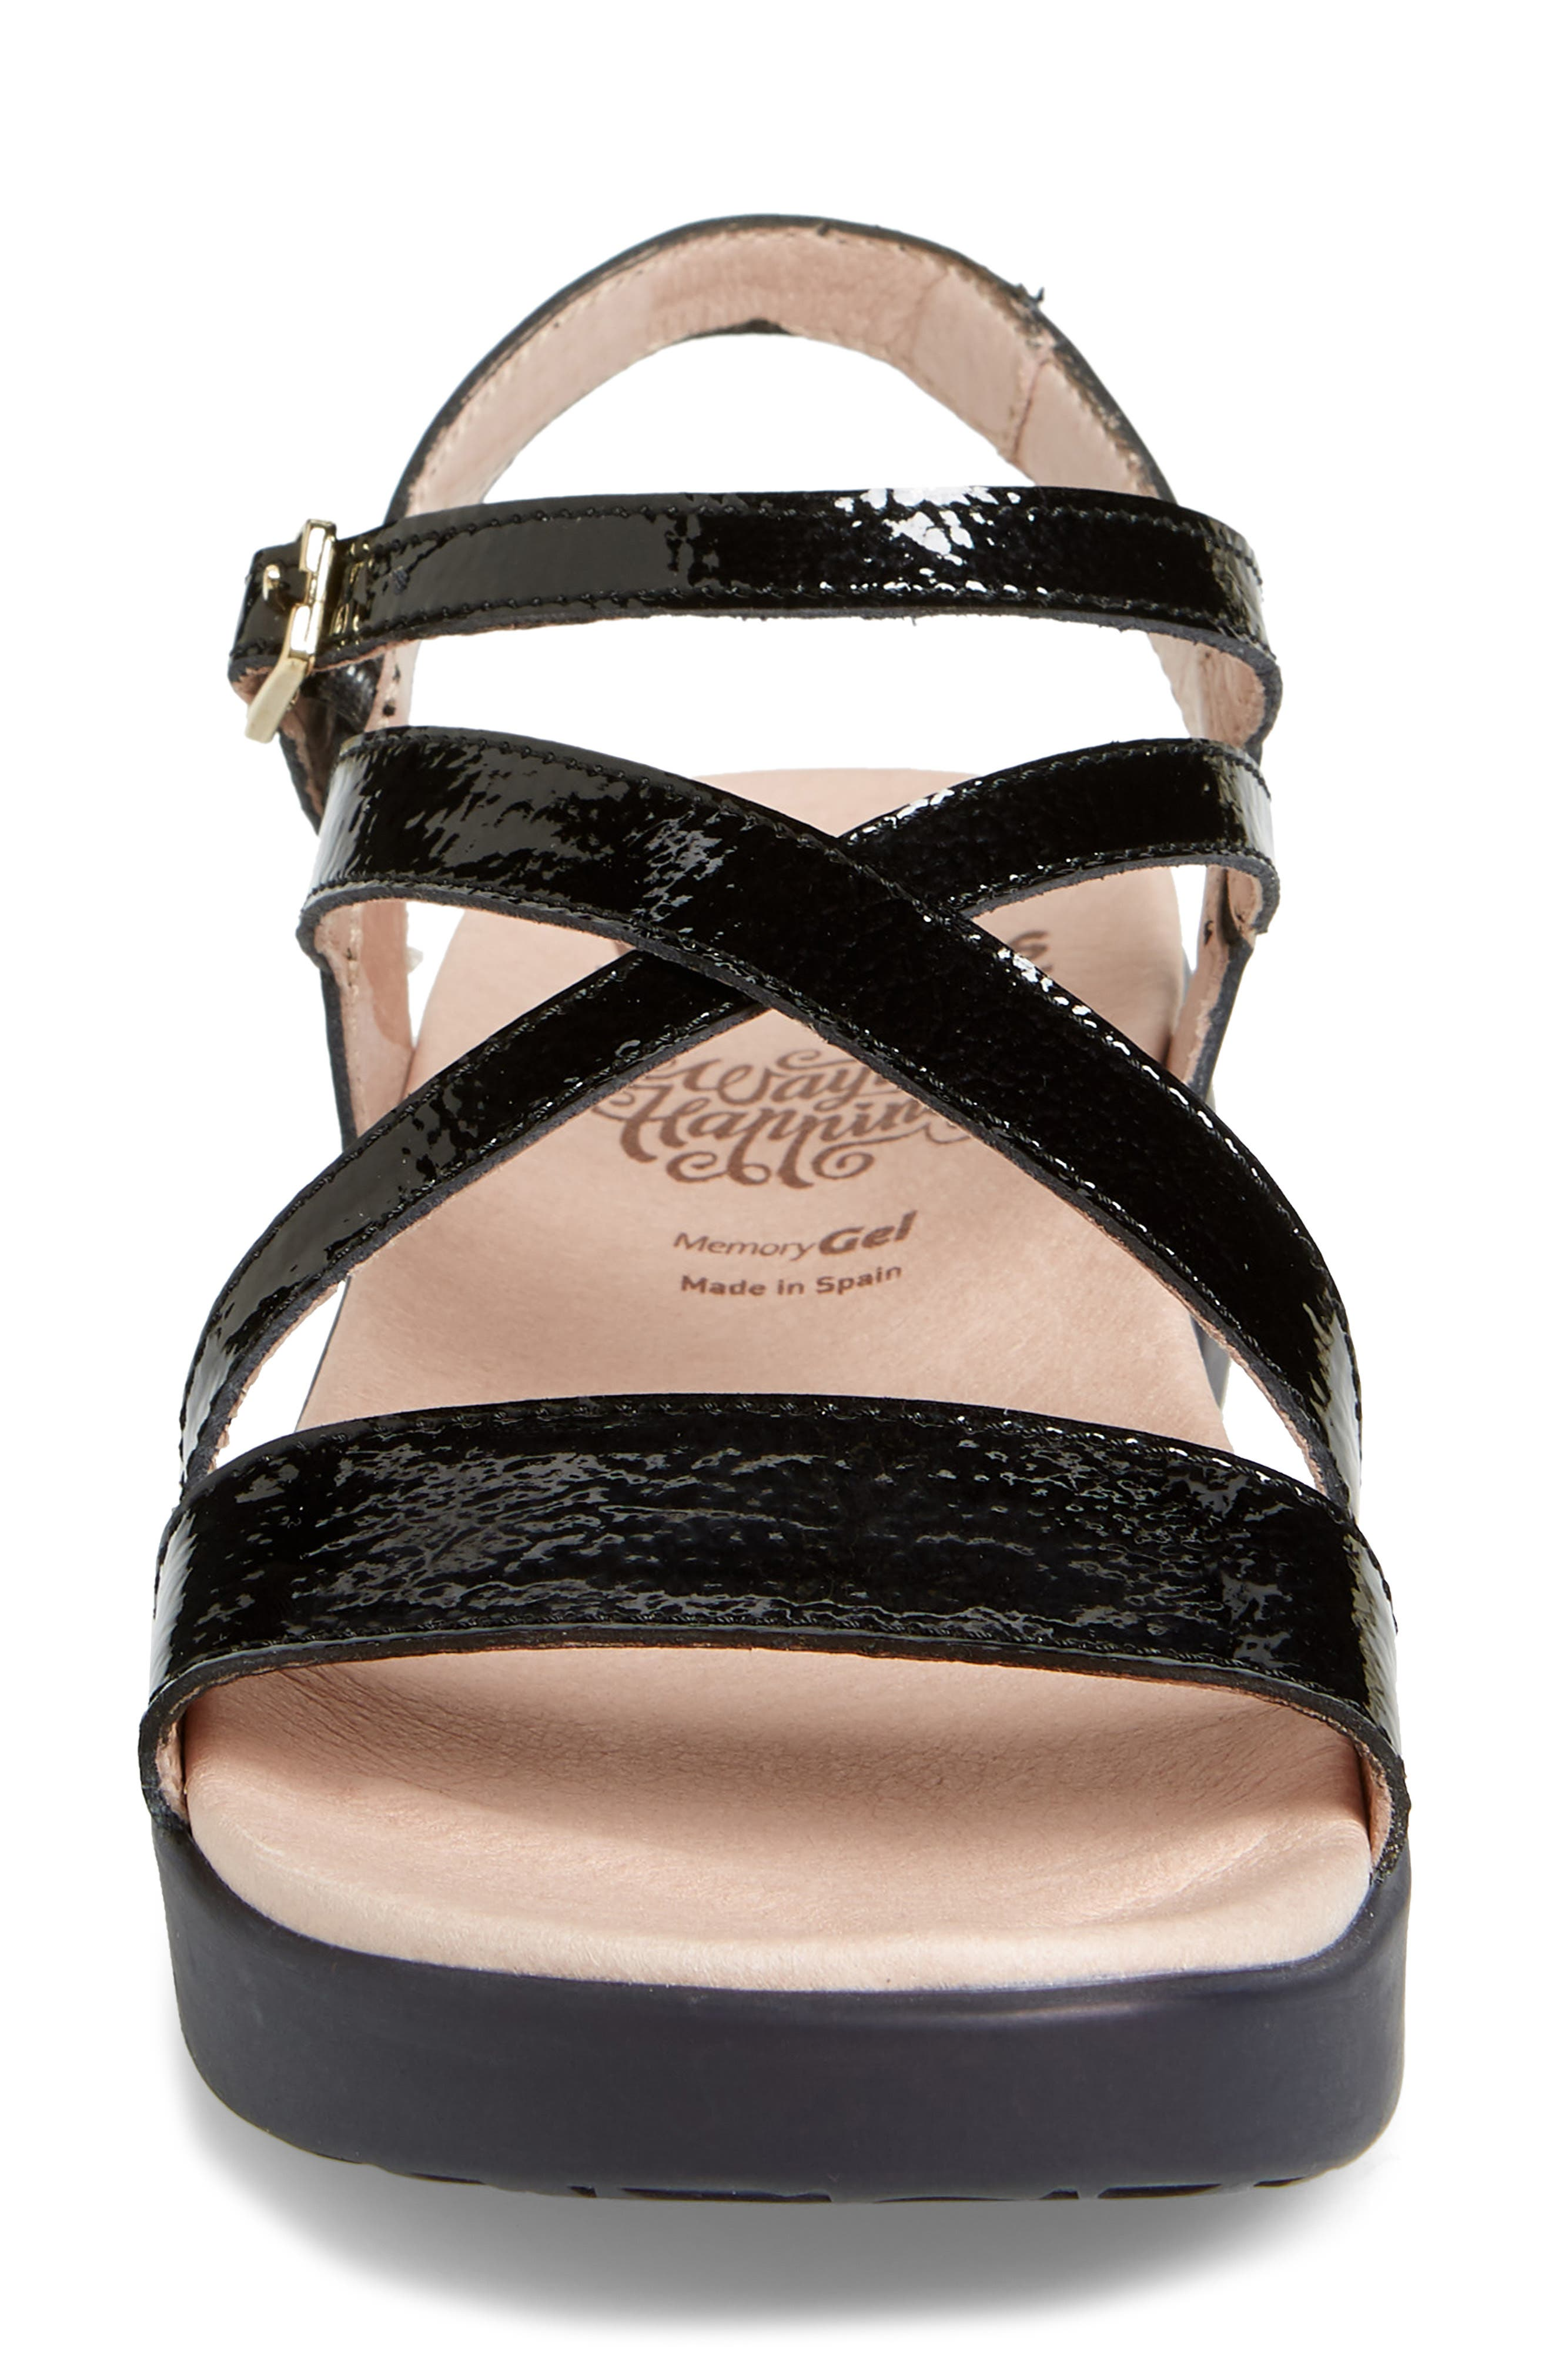 Wedge Sandal,                             Alternate thumbnail 4, color,                             BLACK PATENT LEATHER